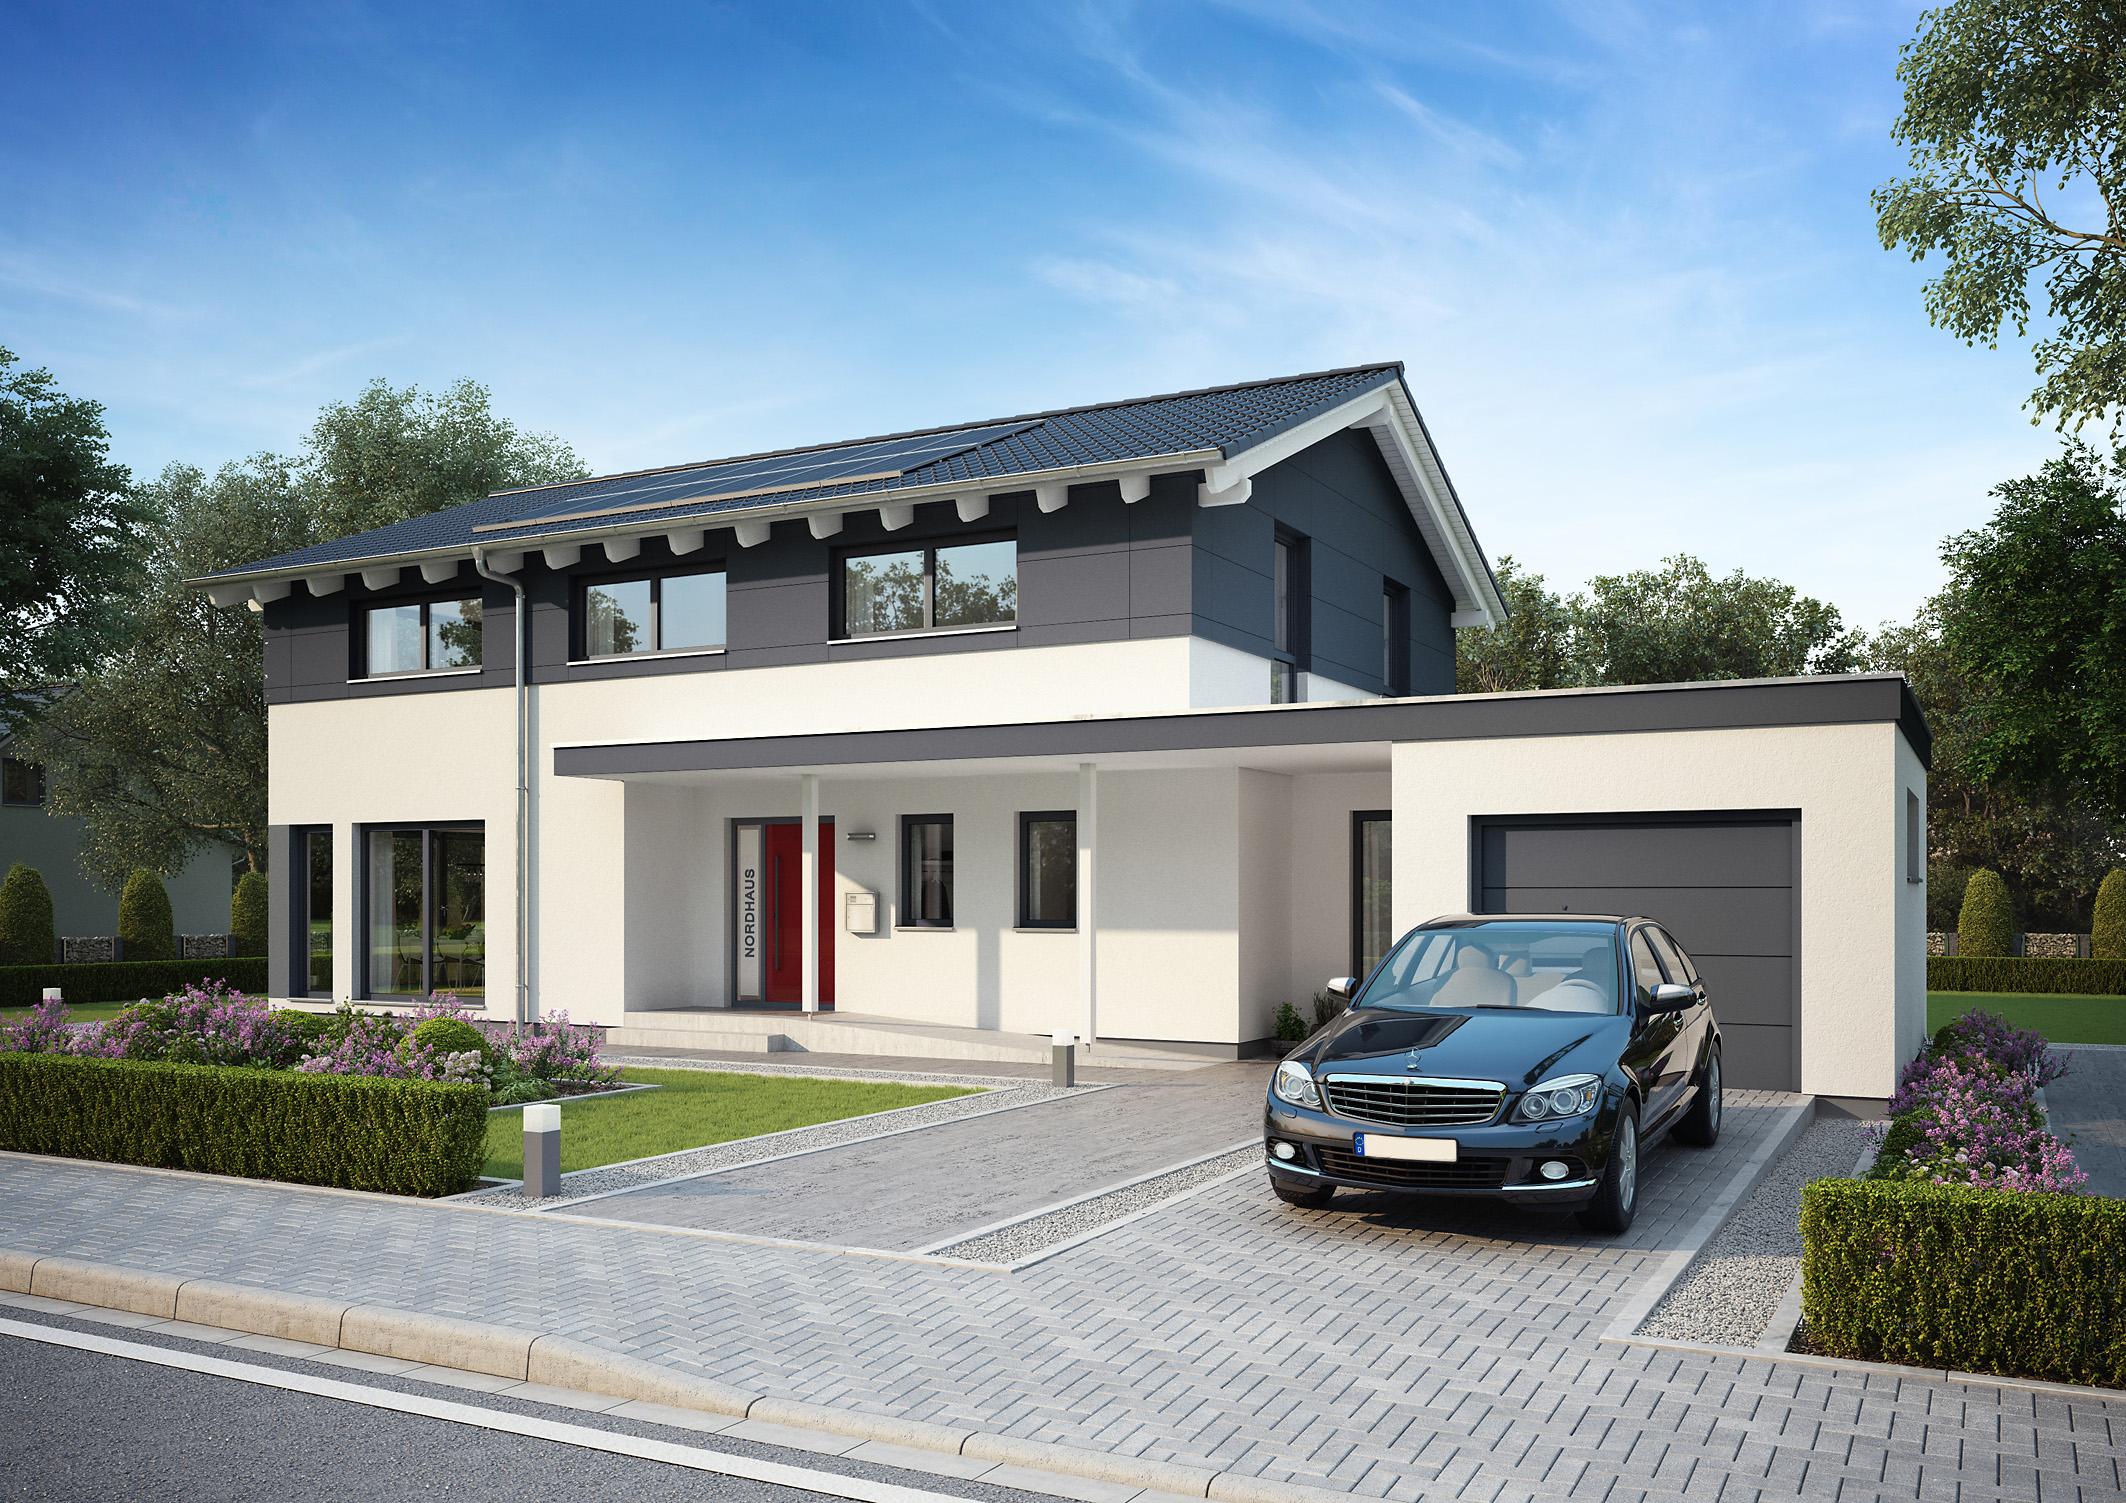 pm 2016 bdf eroeffnung nordhaus. Black Bedroom Furniture Sets. Home Design Ideas